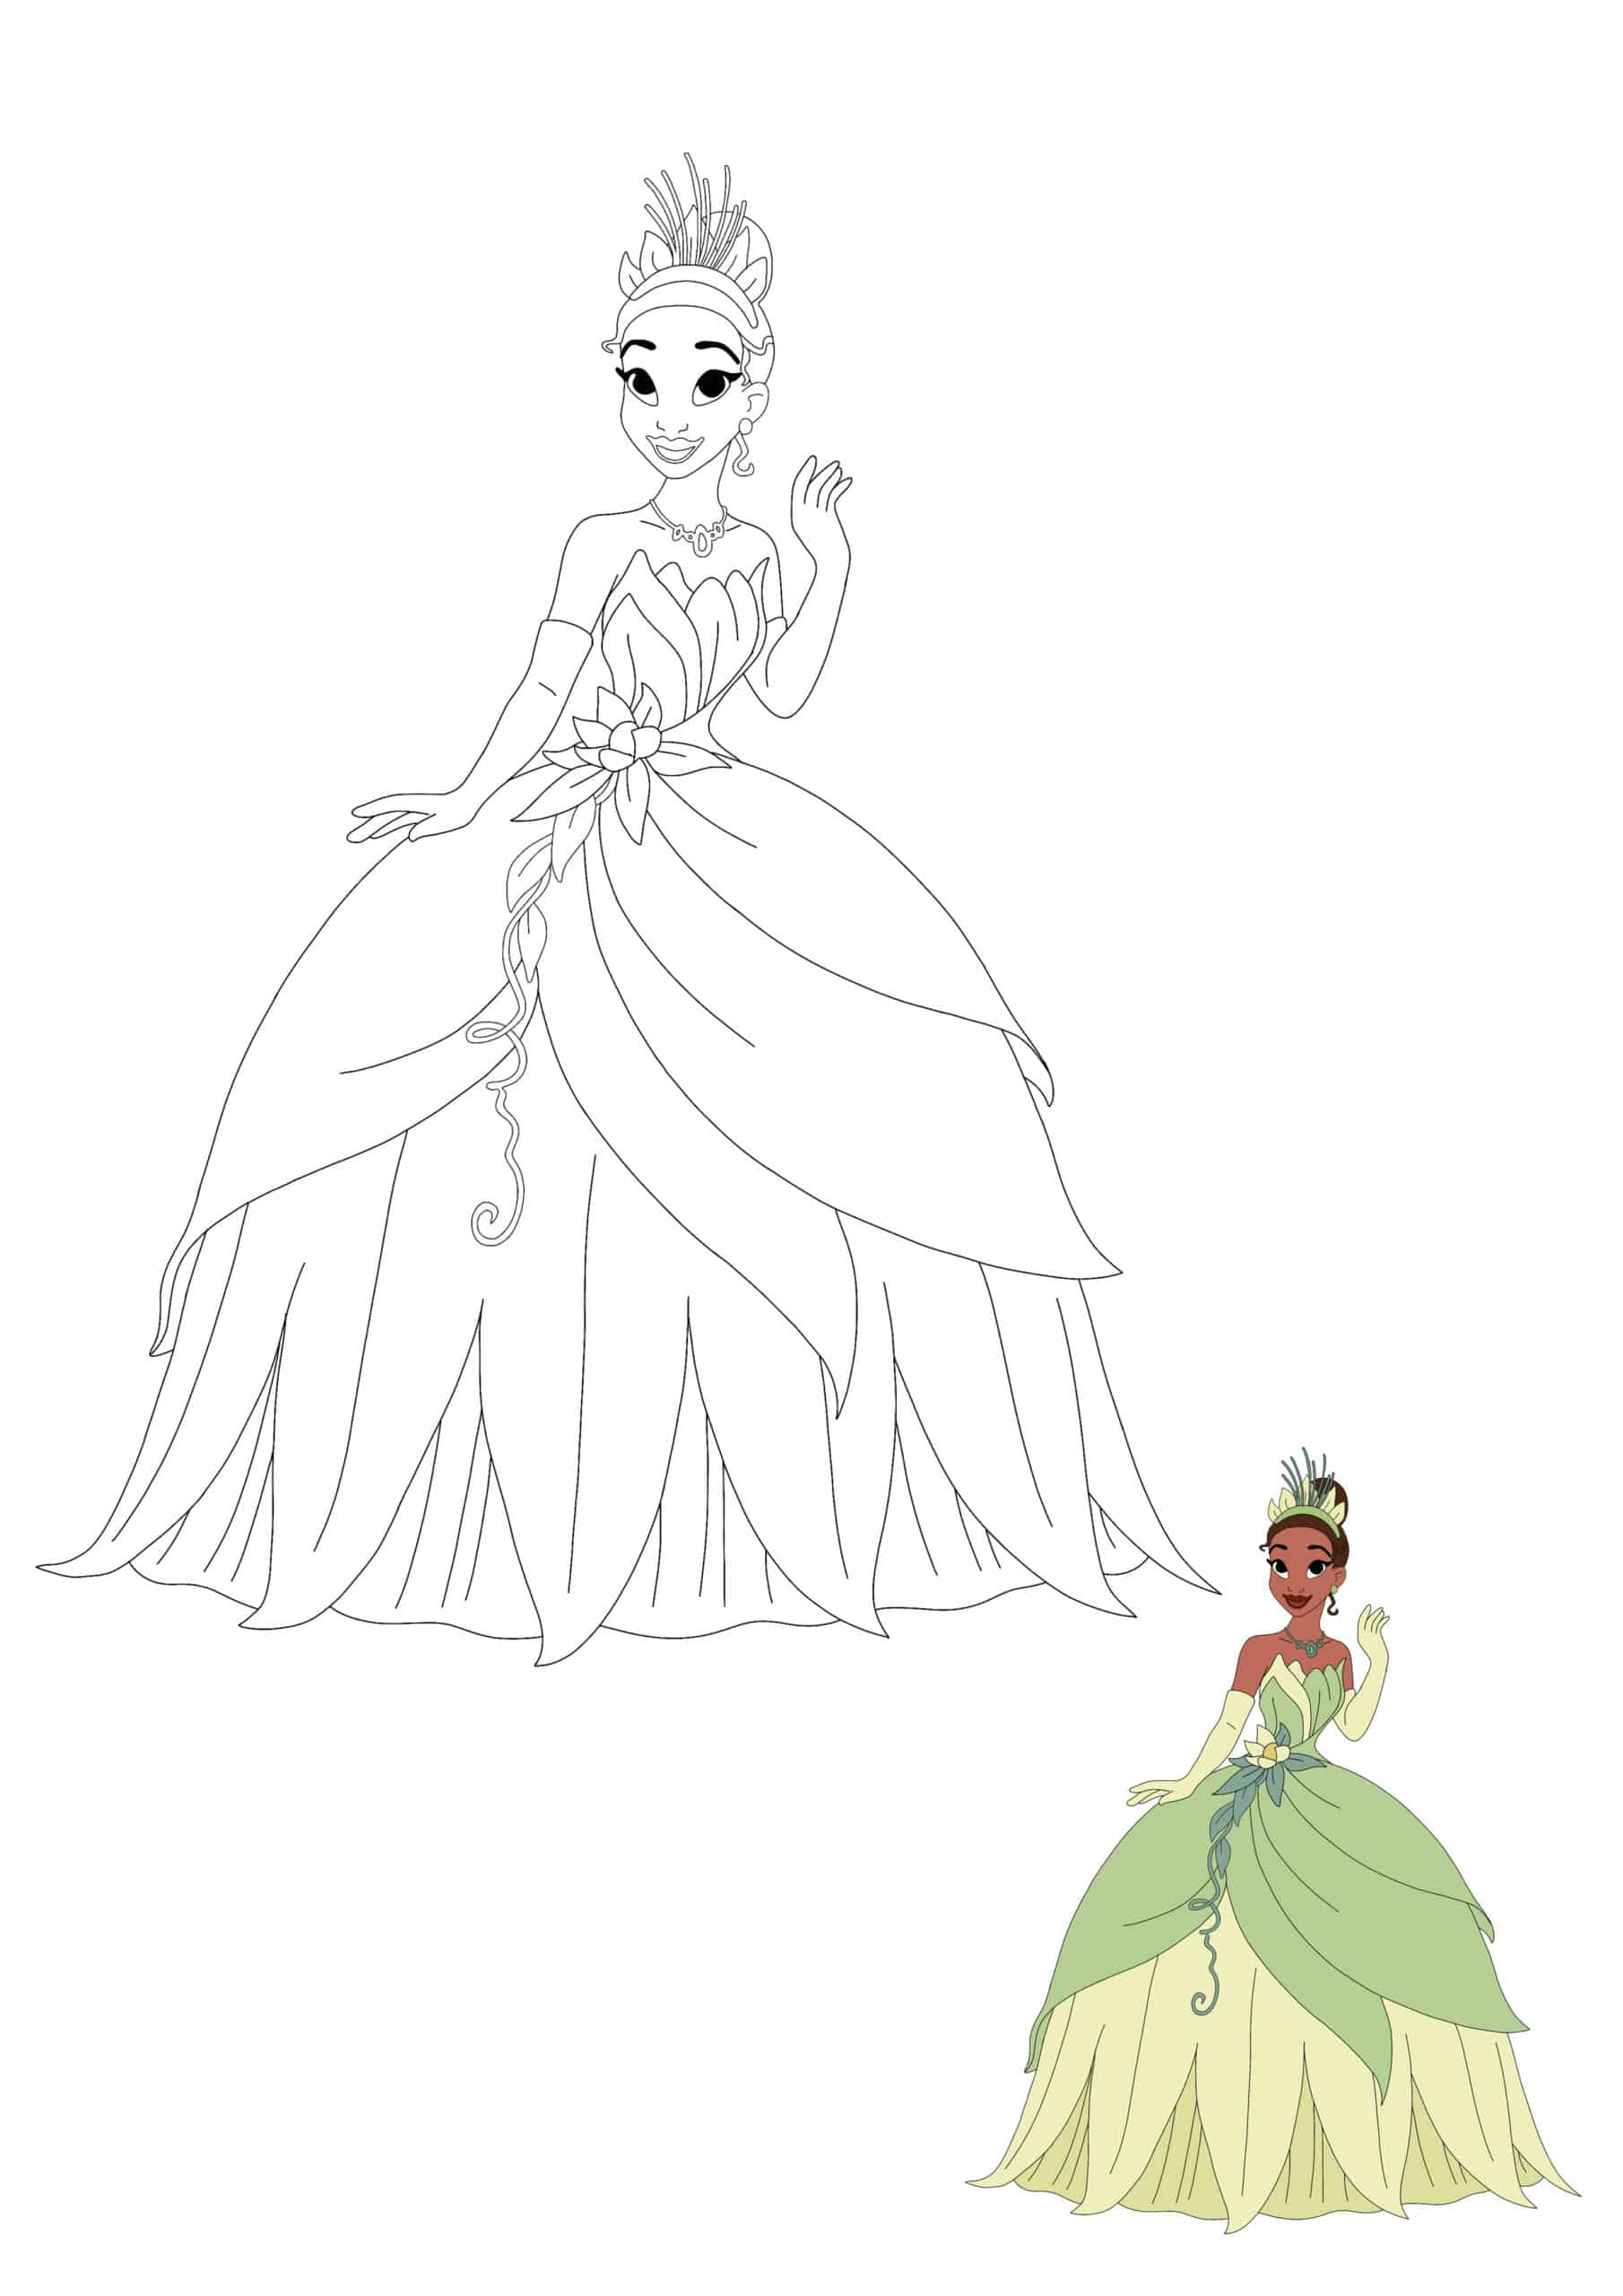 Coloriage Princesse Tiana À Imprimer Gratuit